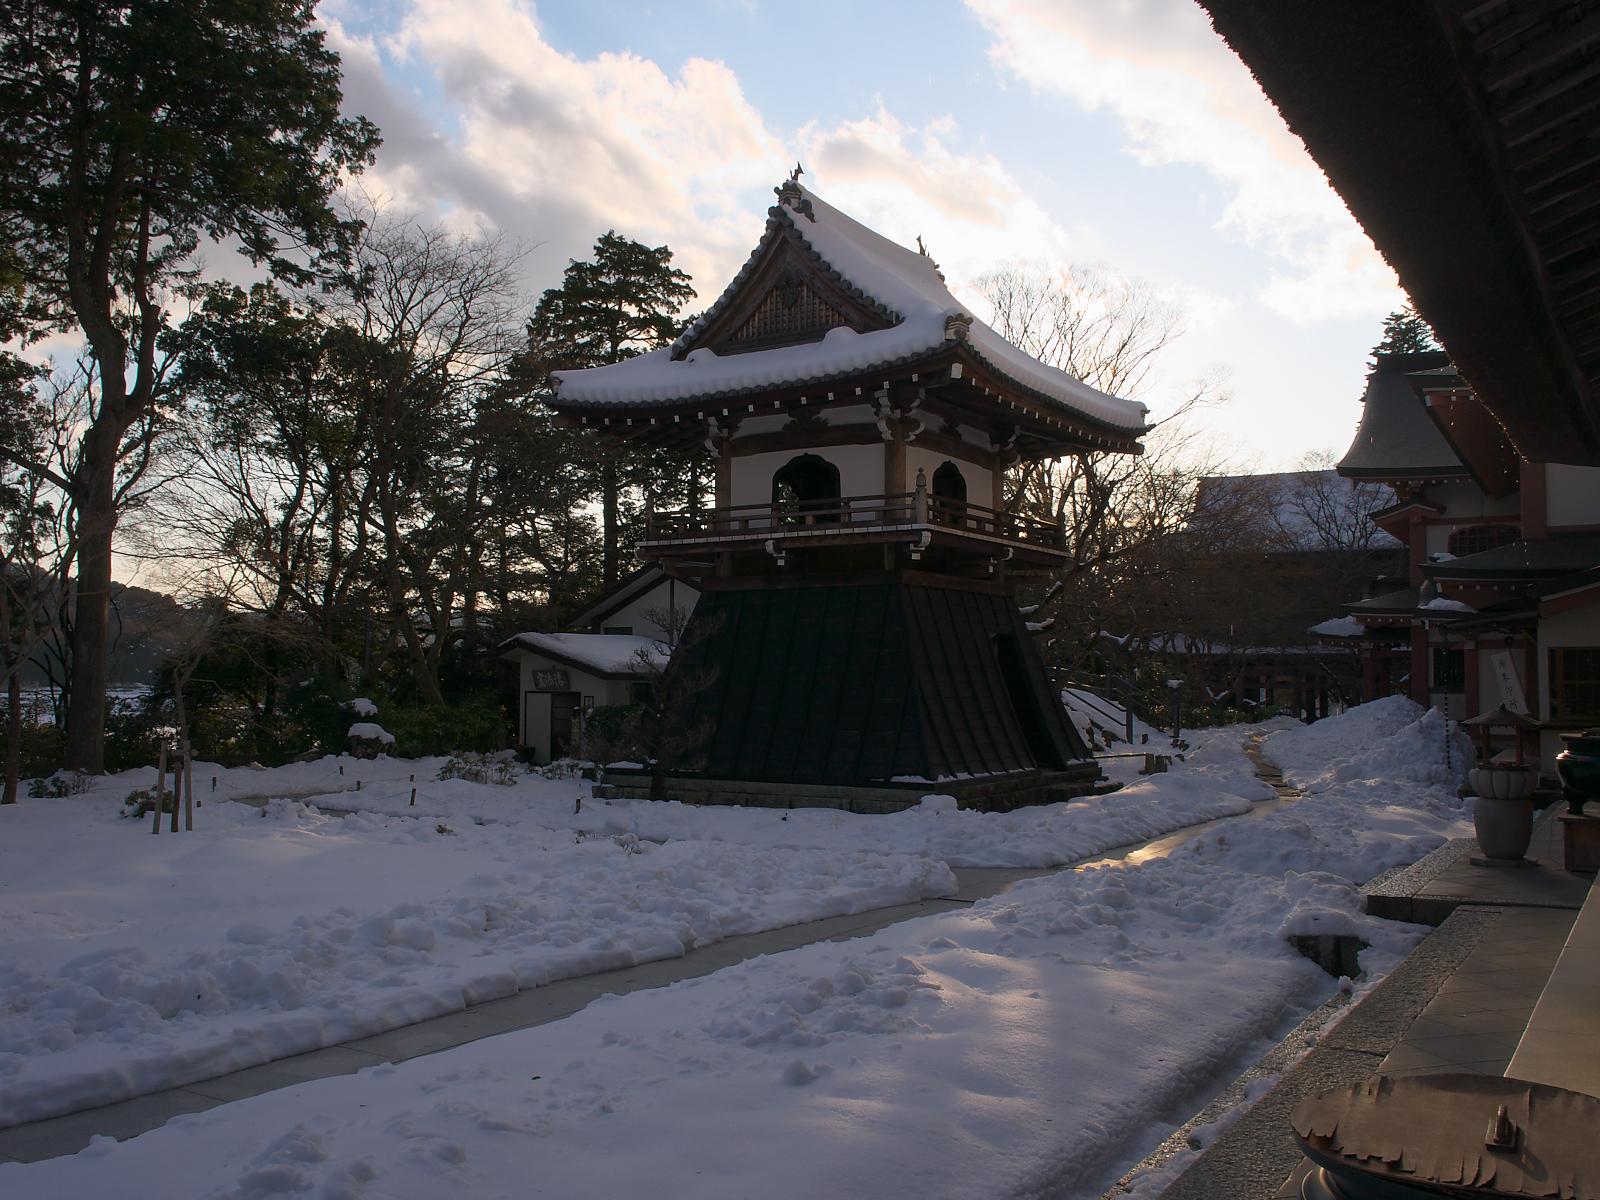 http://www.eigenji-t.jp/admission/images/R0010101.jpg